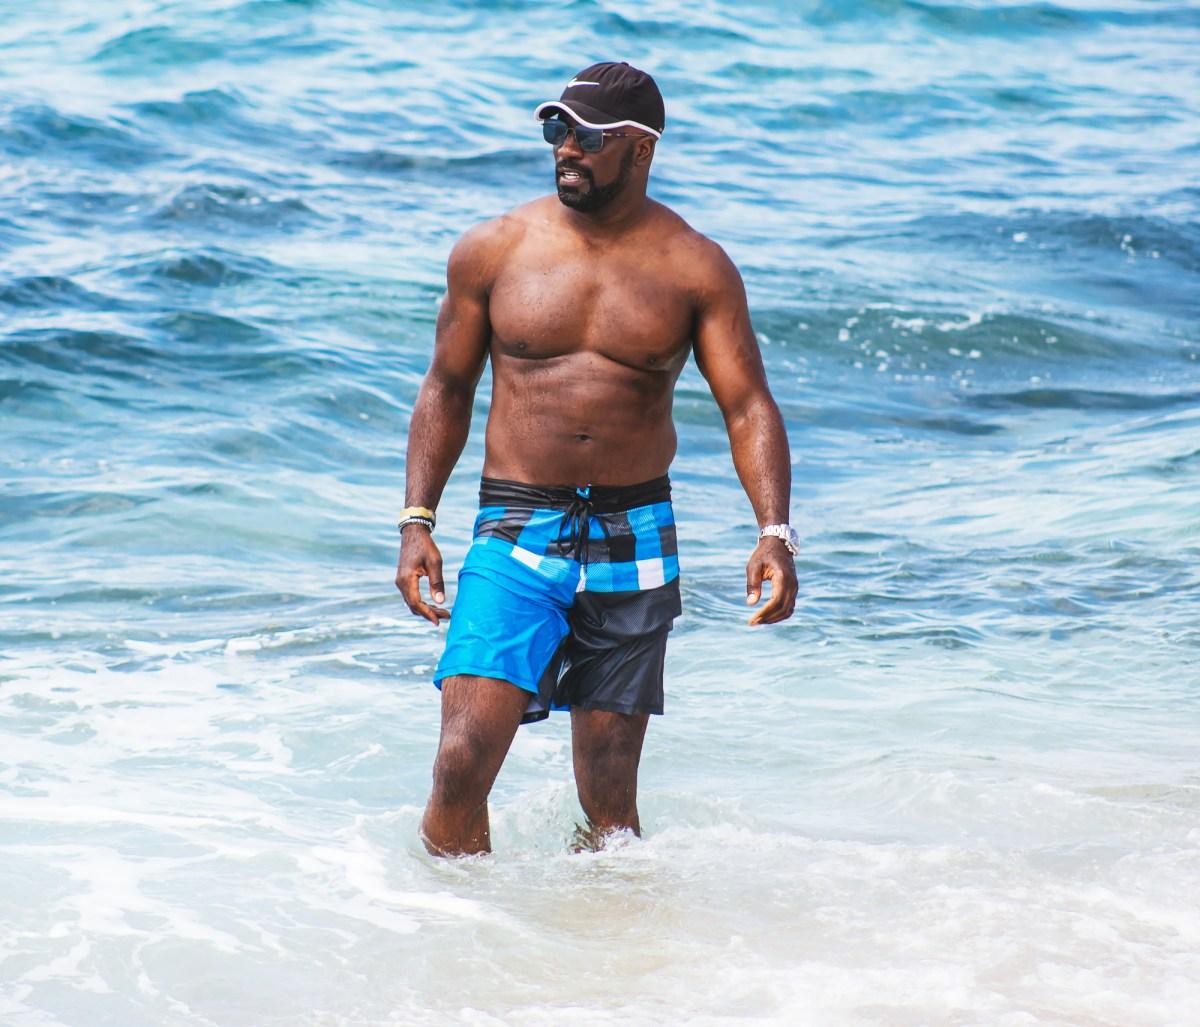 72e69d60ec Hottest Celebrity Men at the Beach in Swim Trunks, Shirtless